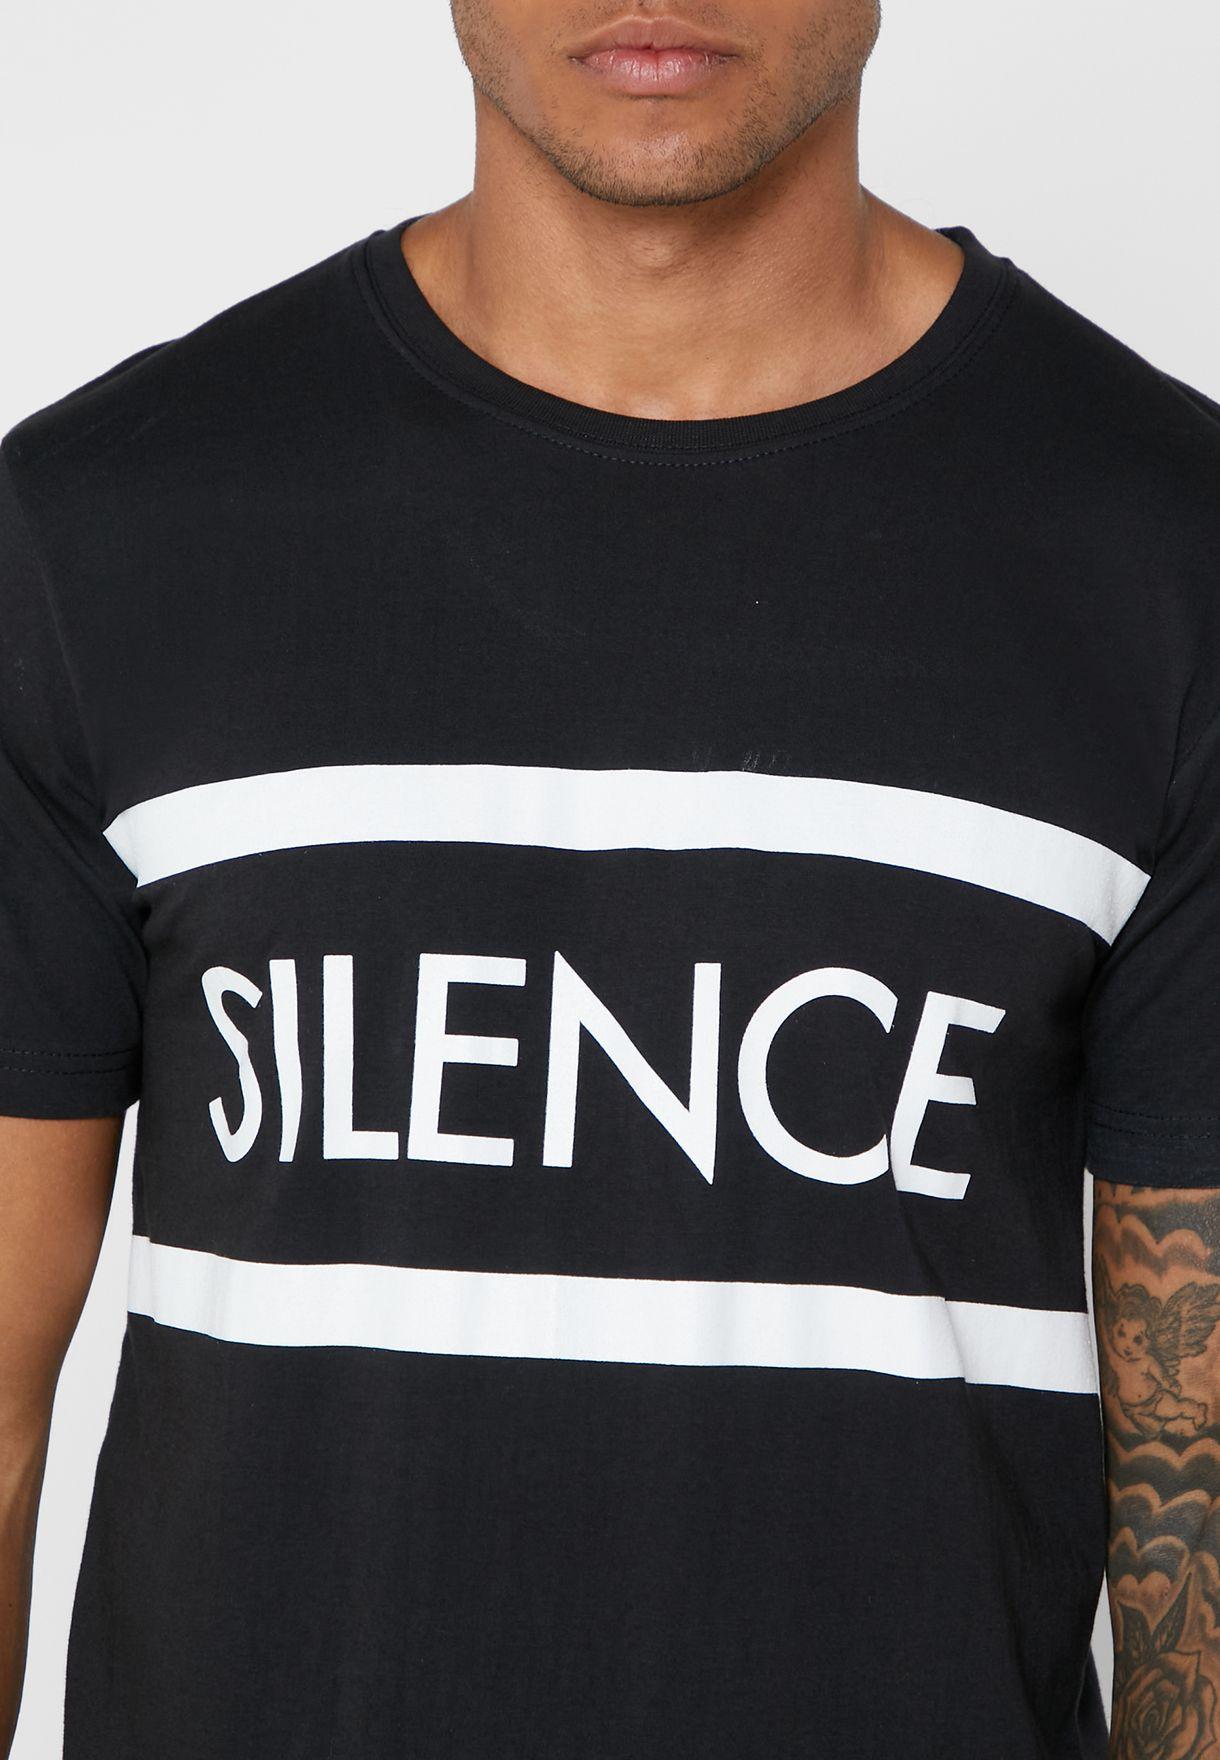 Silence Crew Neck T-Shirt